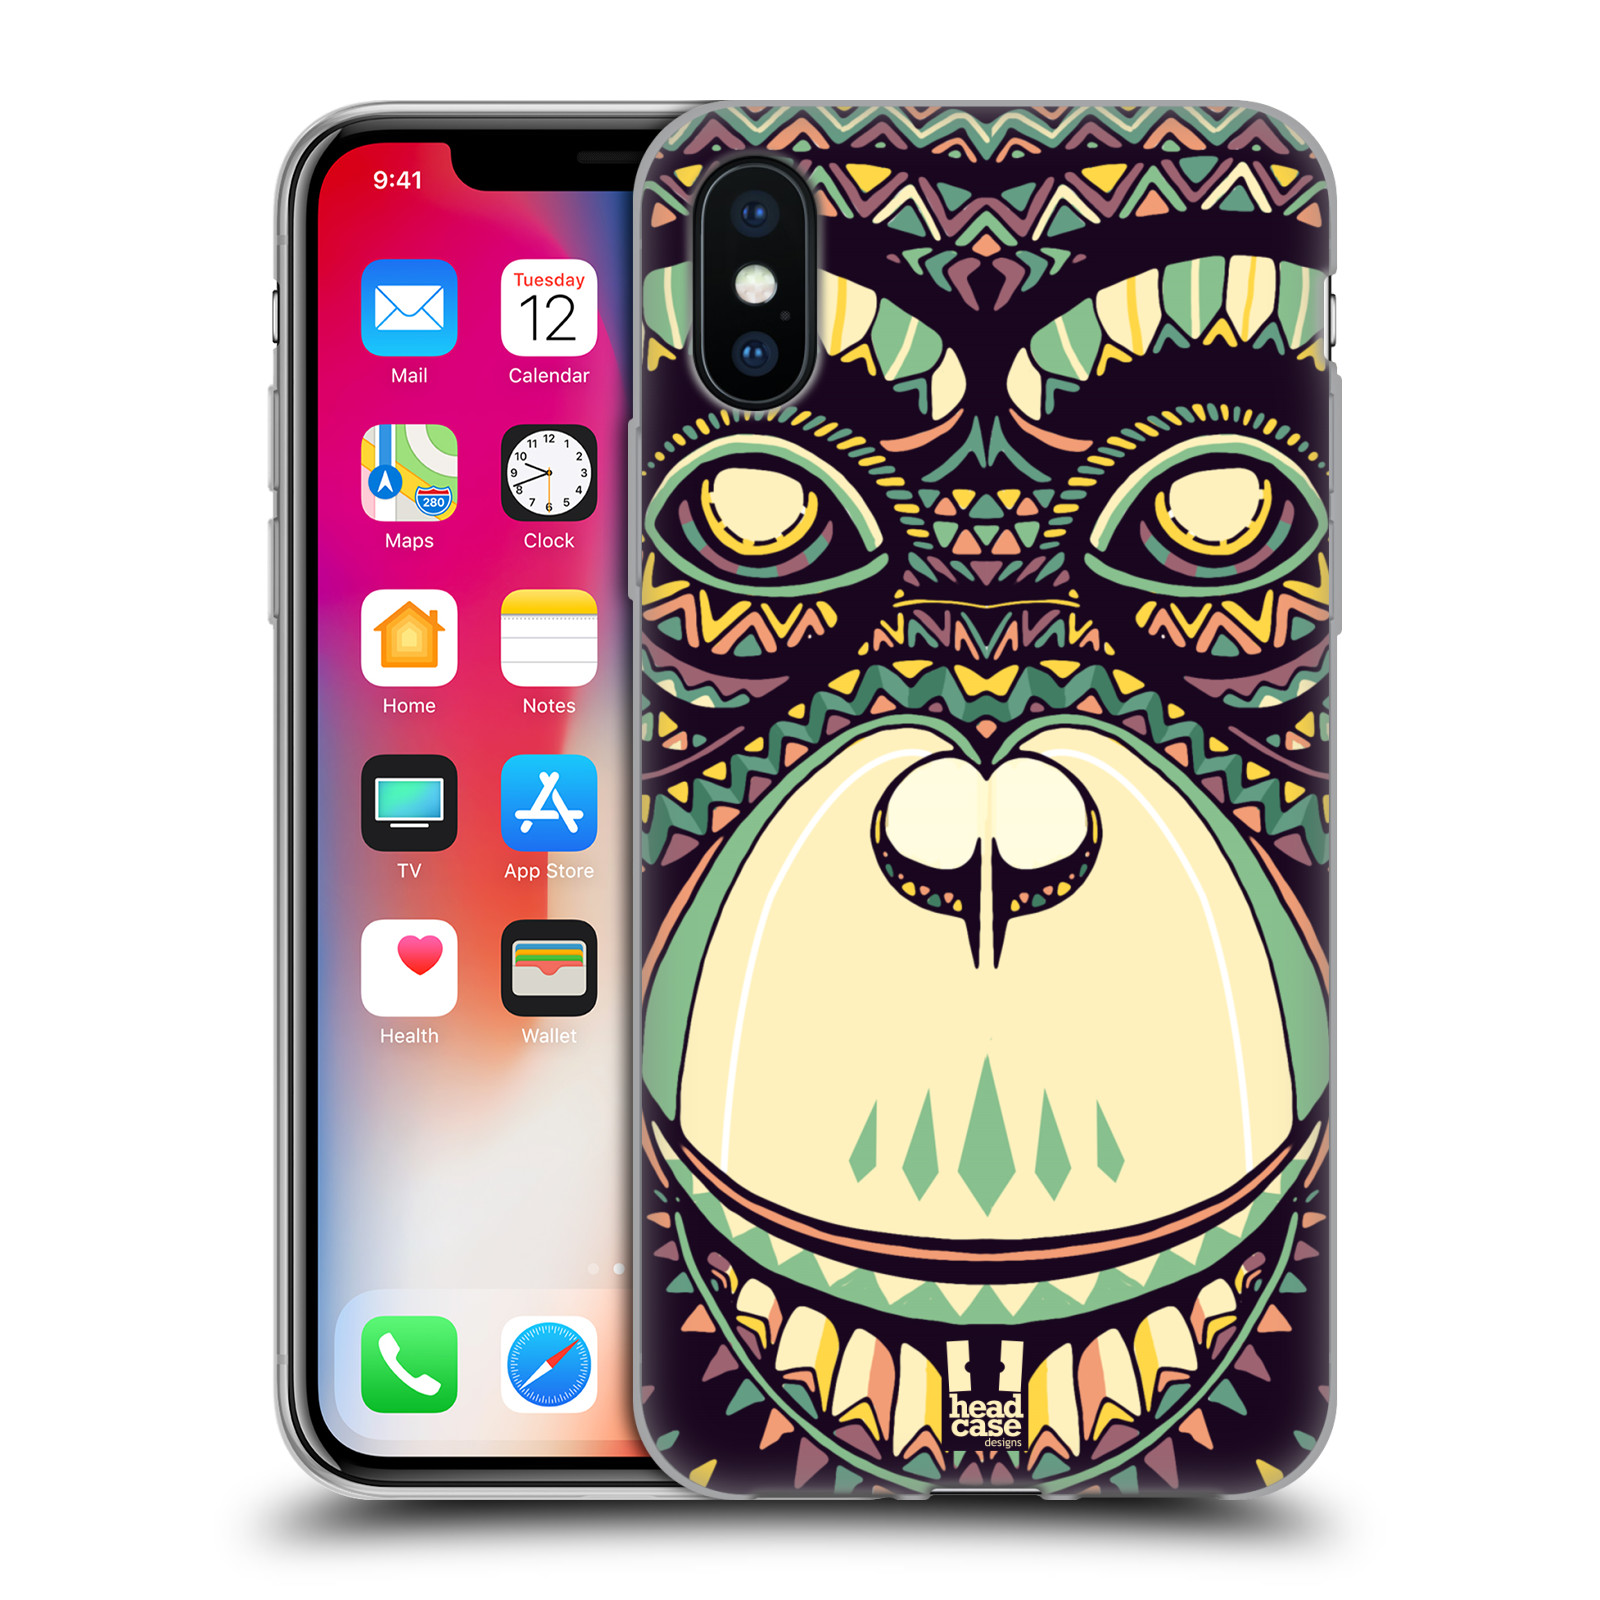 HEAD-CASE-DESIGNS-AZTEC-ANIMAL-FACES-3-SOFT-GEL-CASE-FOR-APPLE-iPHONE-PHONES